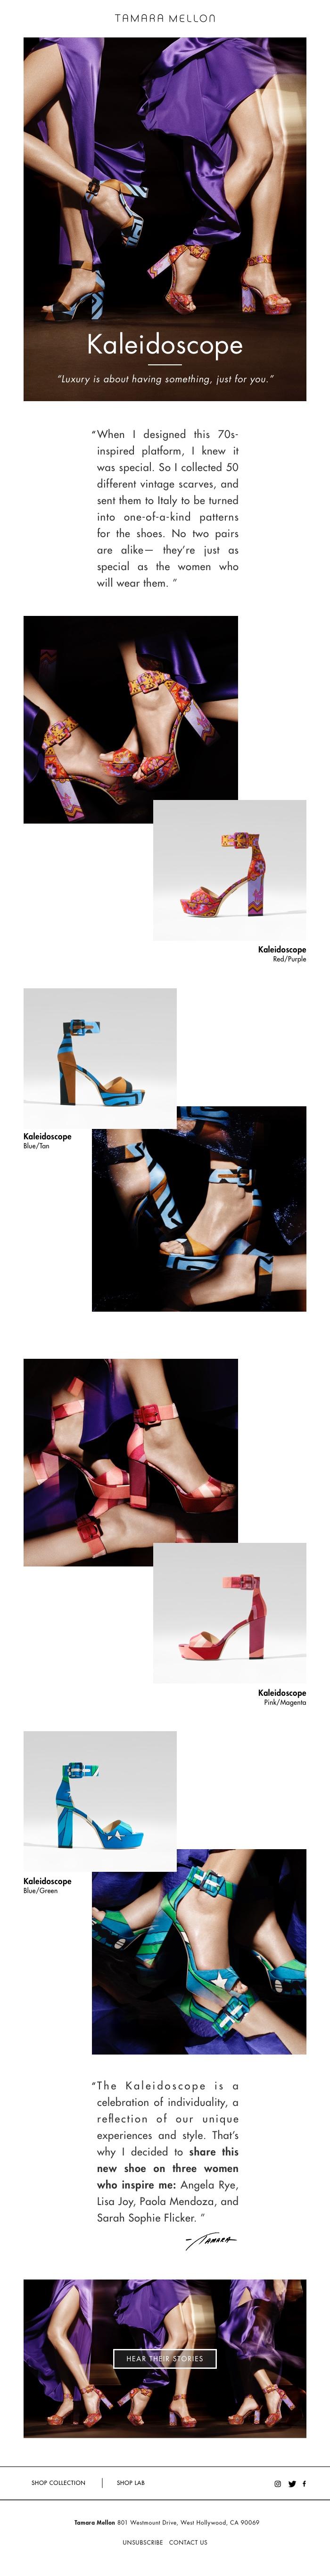 2018-03-08 Kaleidoscope Drop-1.jpg